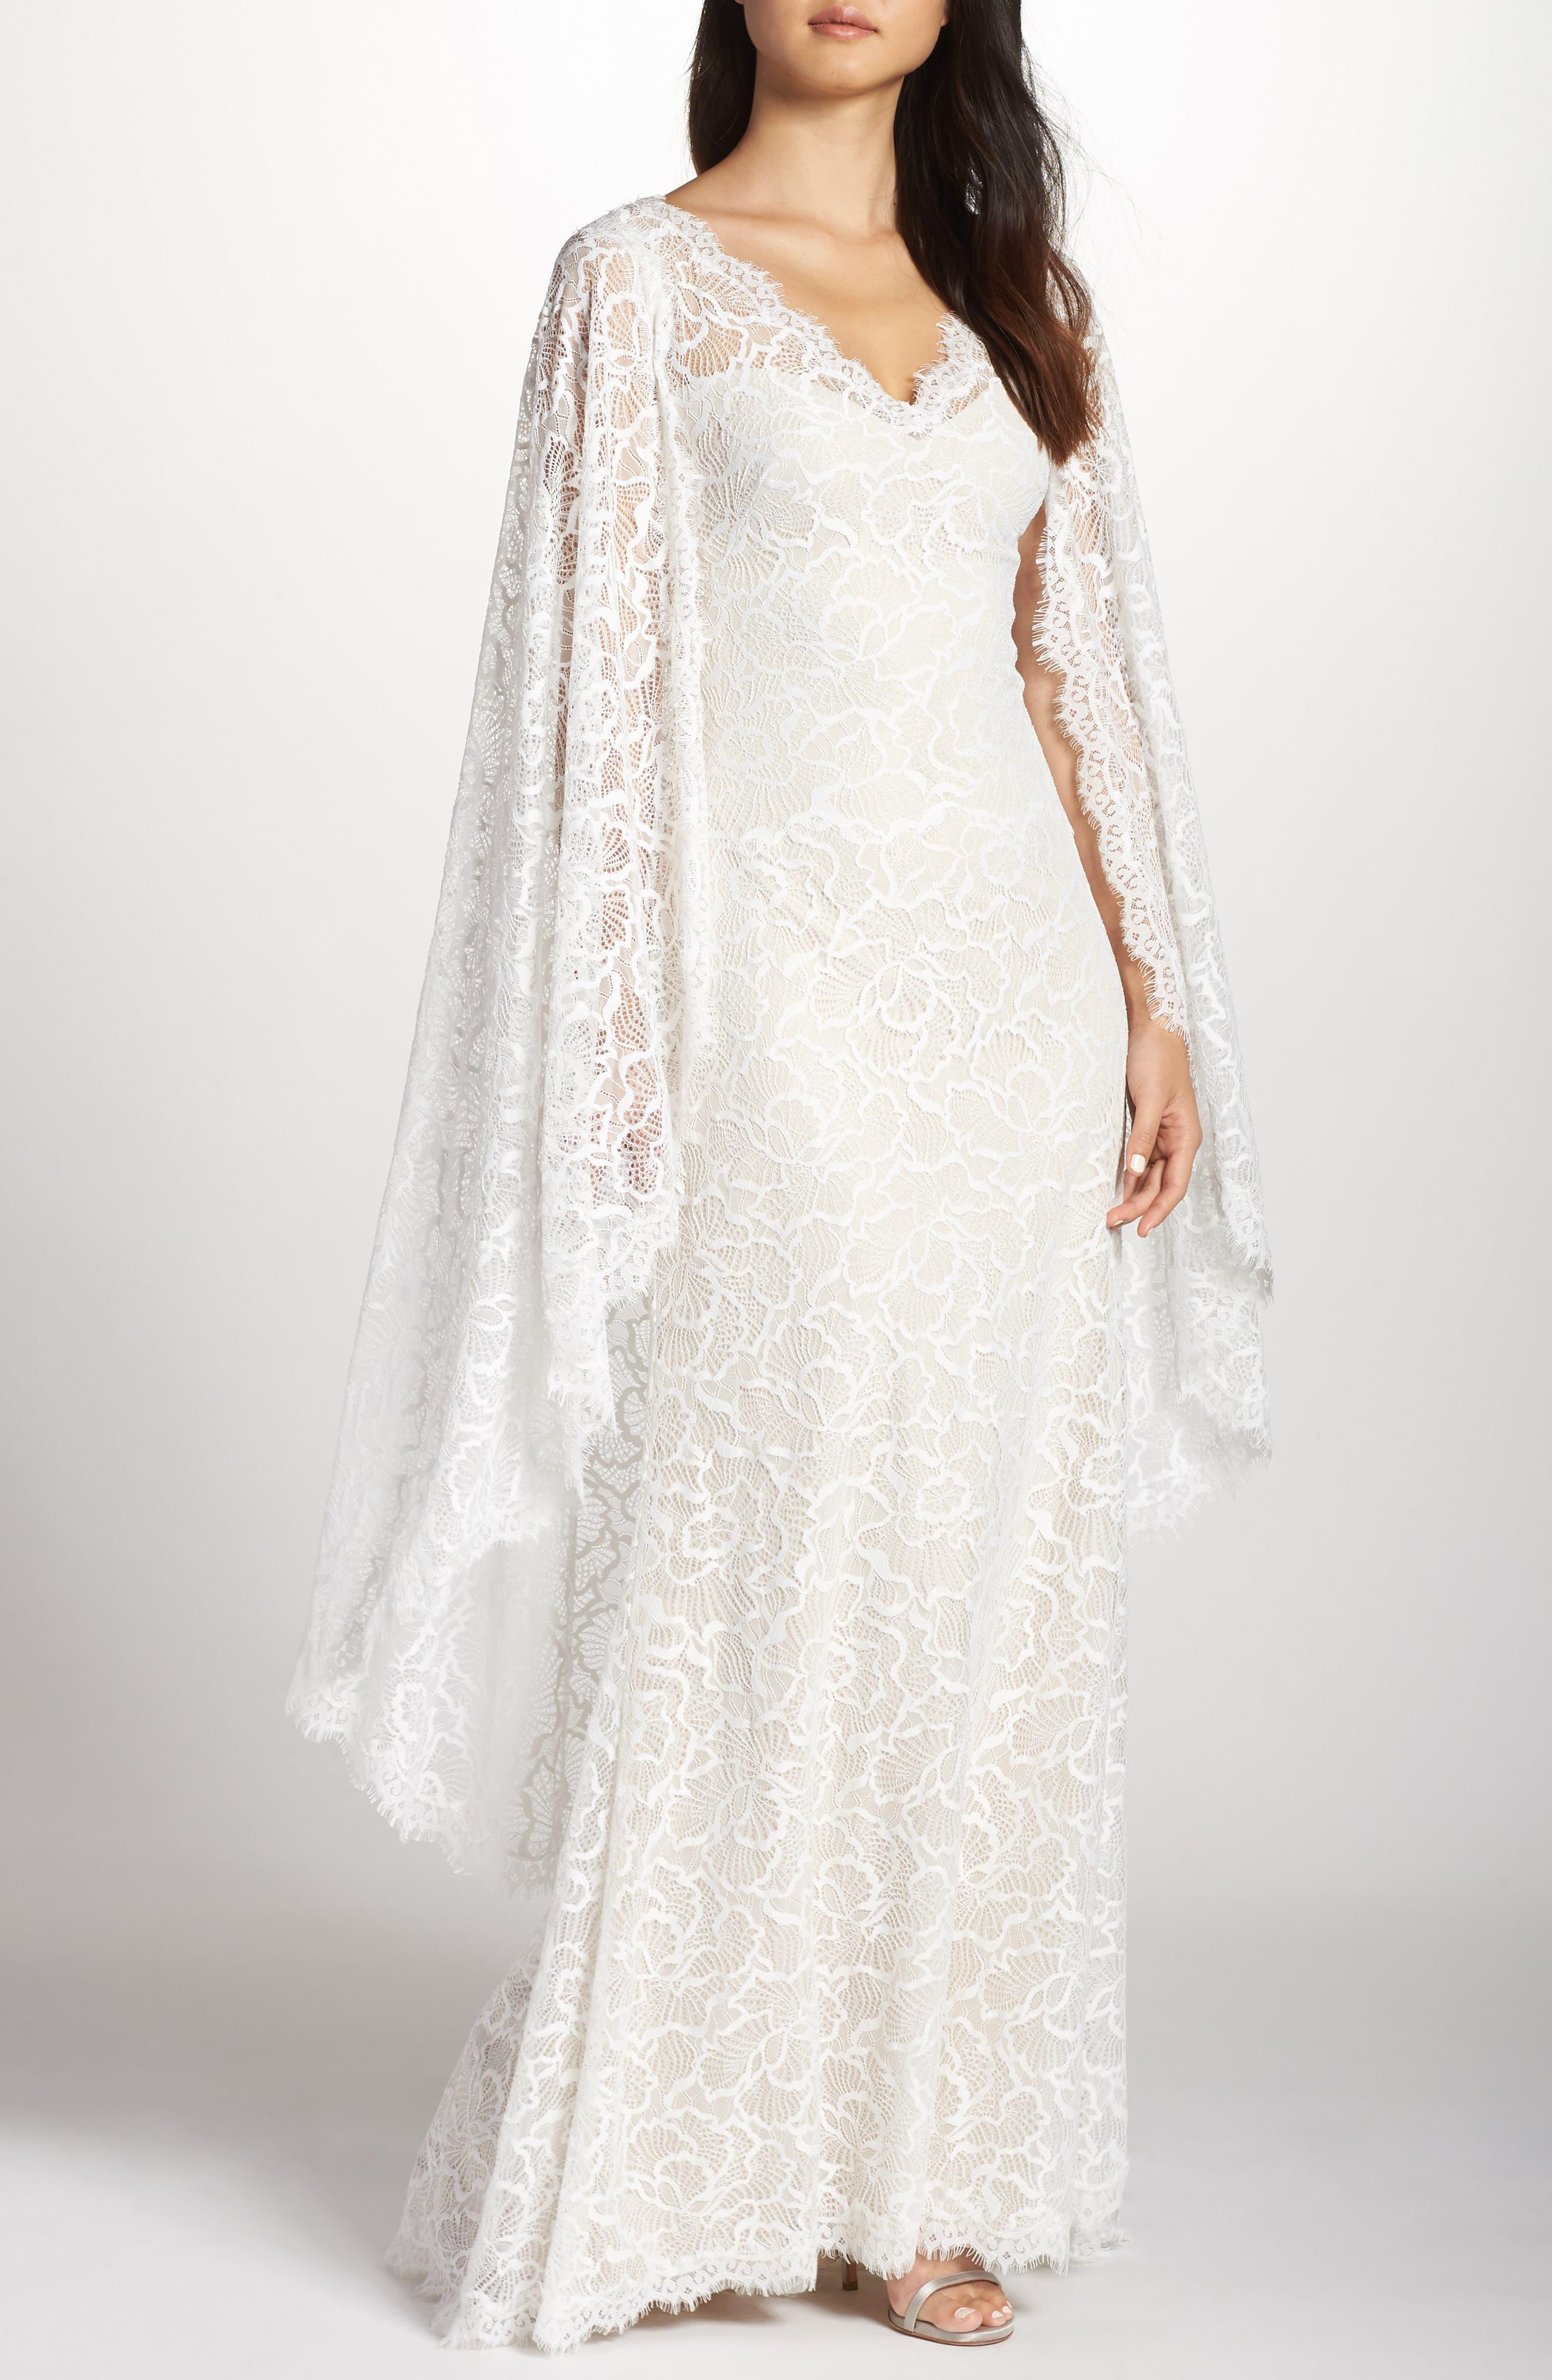 60s Wedding Dresses | 70s Wedding Dresses Womens Tadashi Shoji Cape Detail Lace Gown $928.00 AT vintagedancer.com